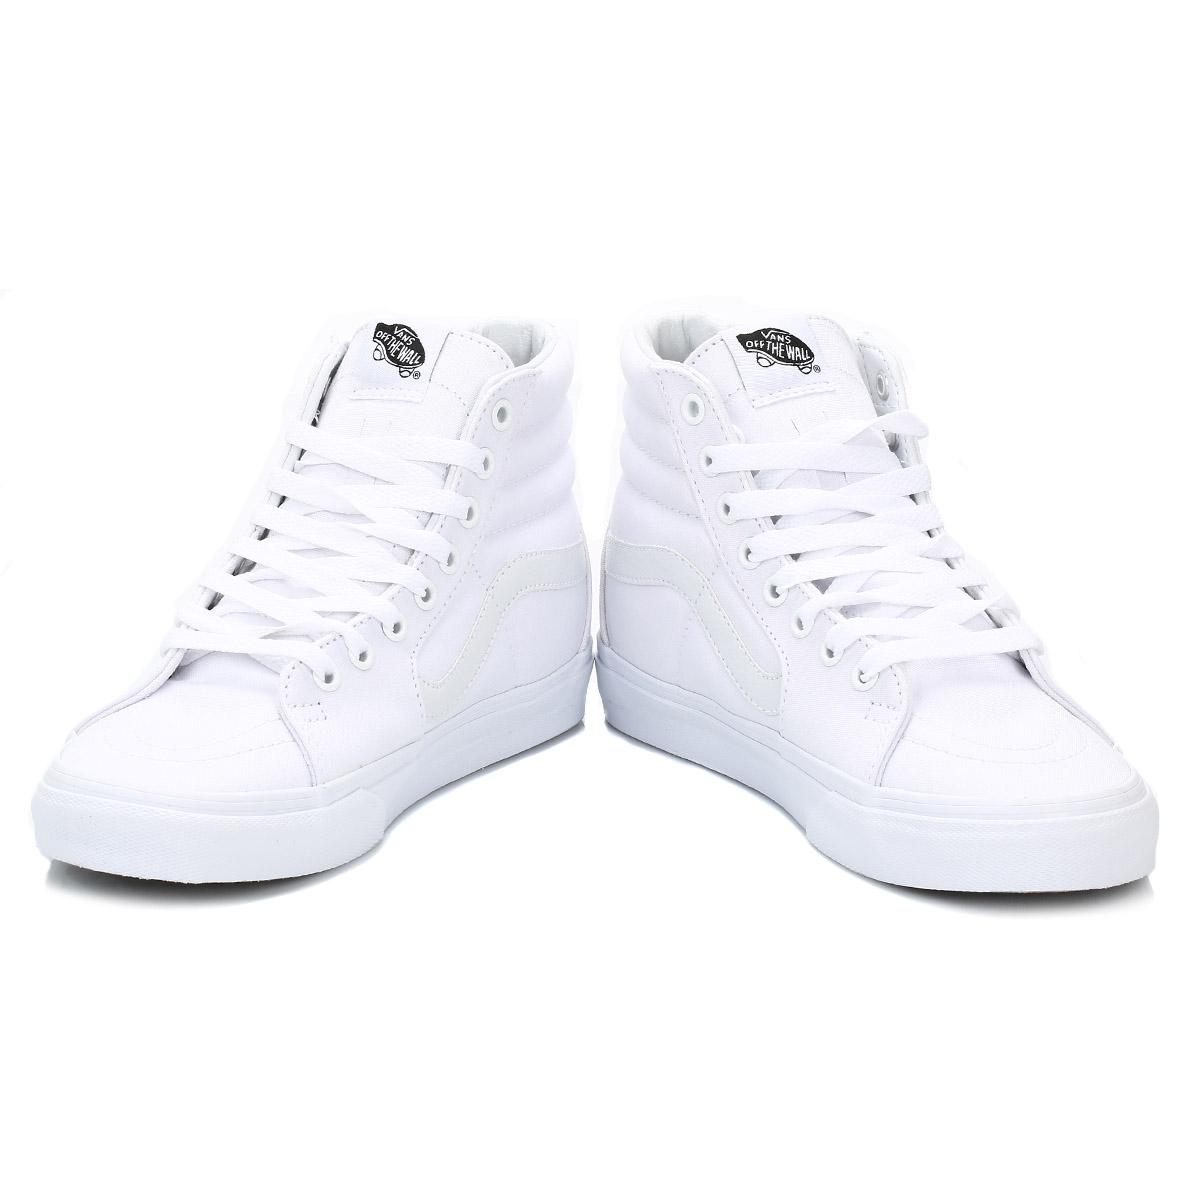 vans men high tops white sk8 hi suede trainers laceup